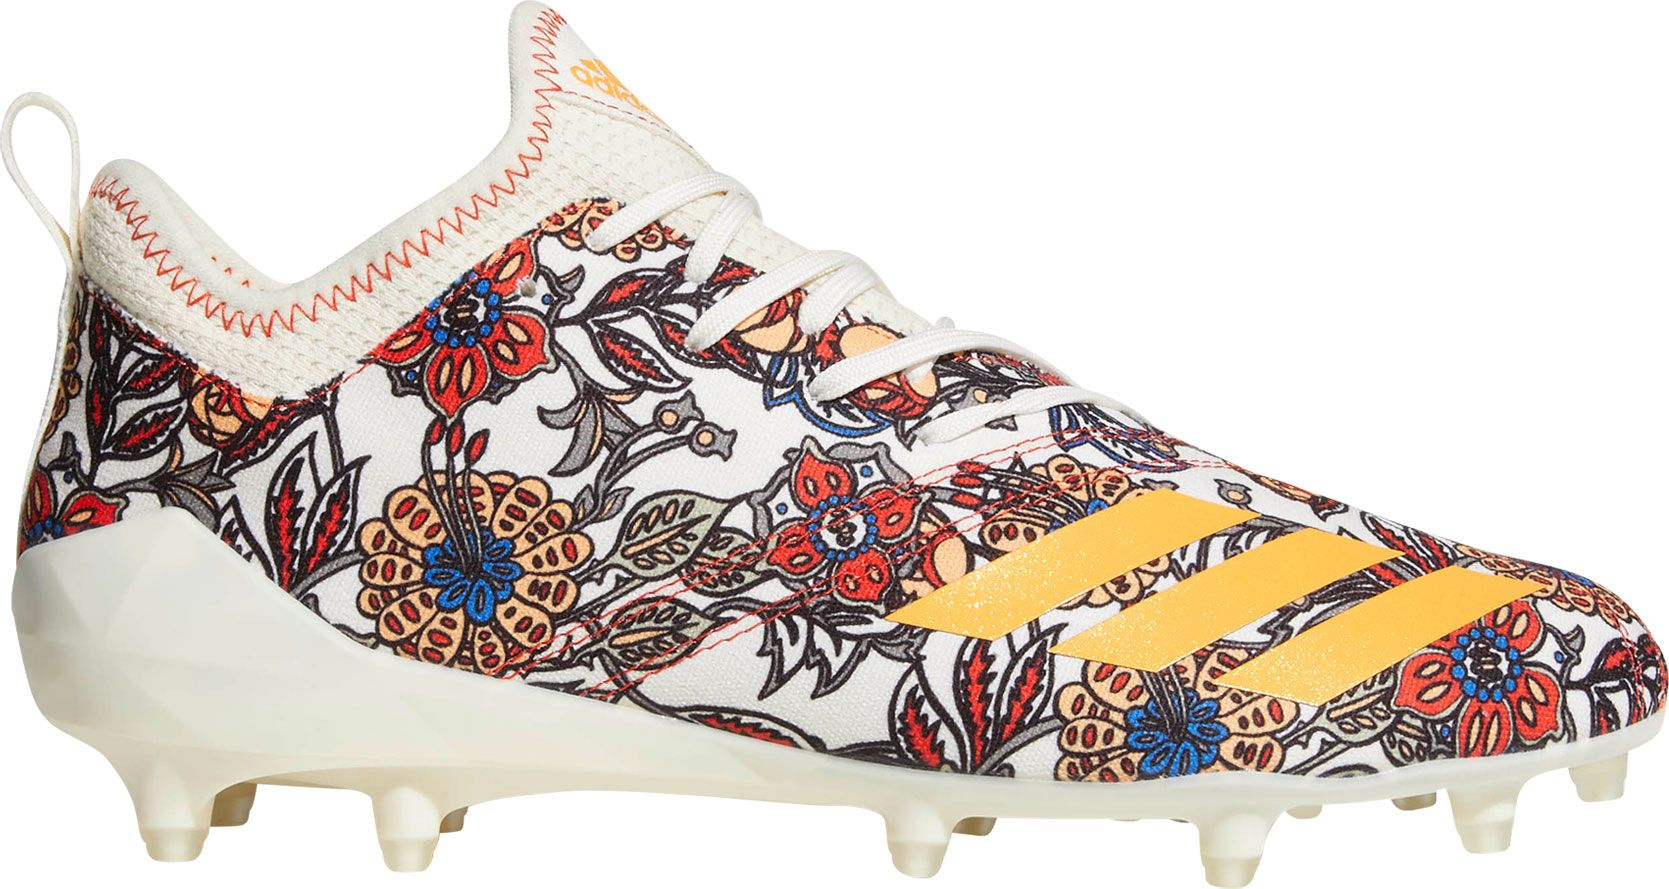 size 40 d96e1 6752b ... adidas football cleats 5 star adidas Menu0027s adiZERO ...